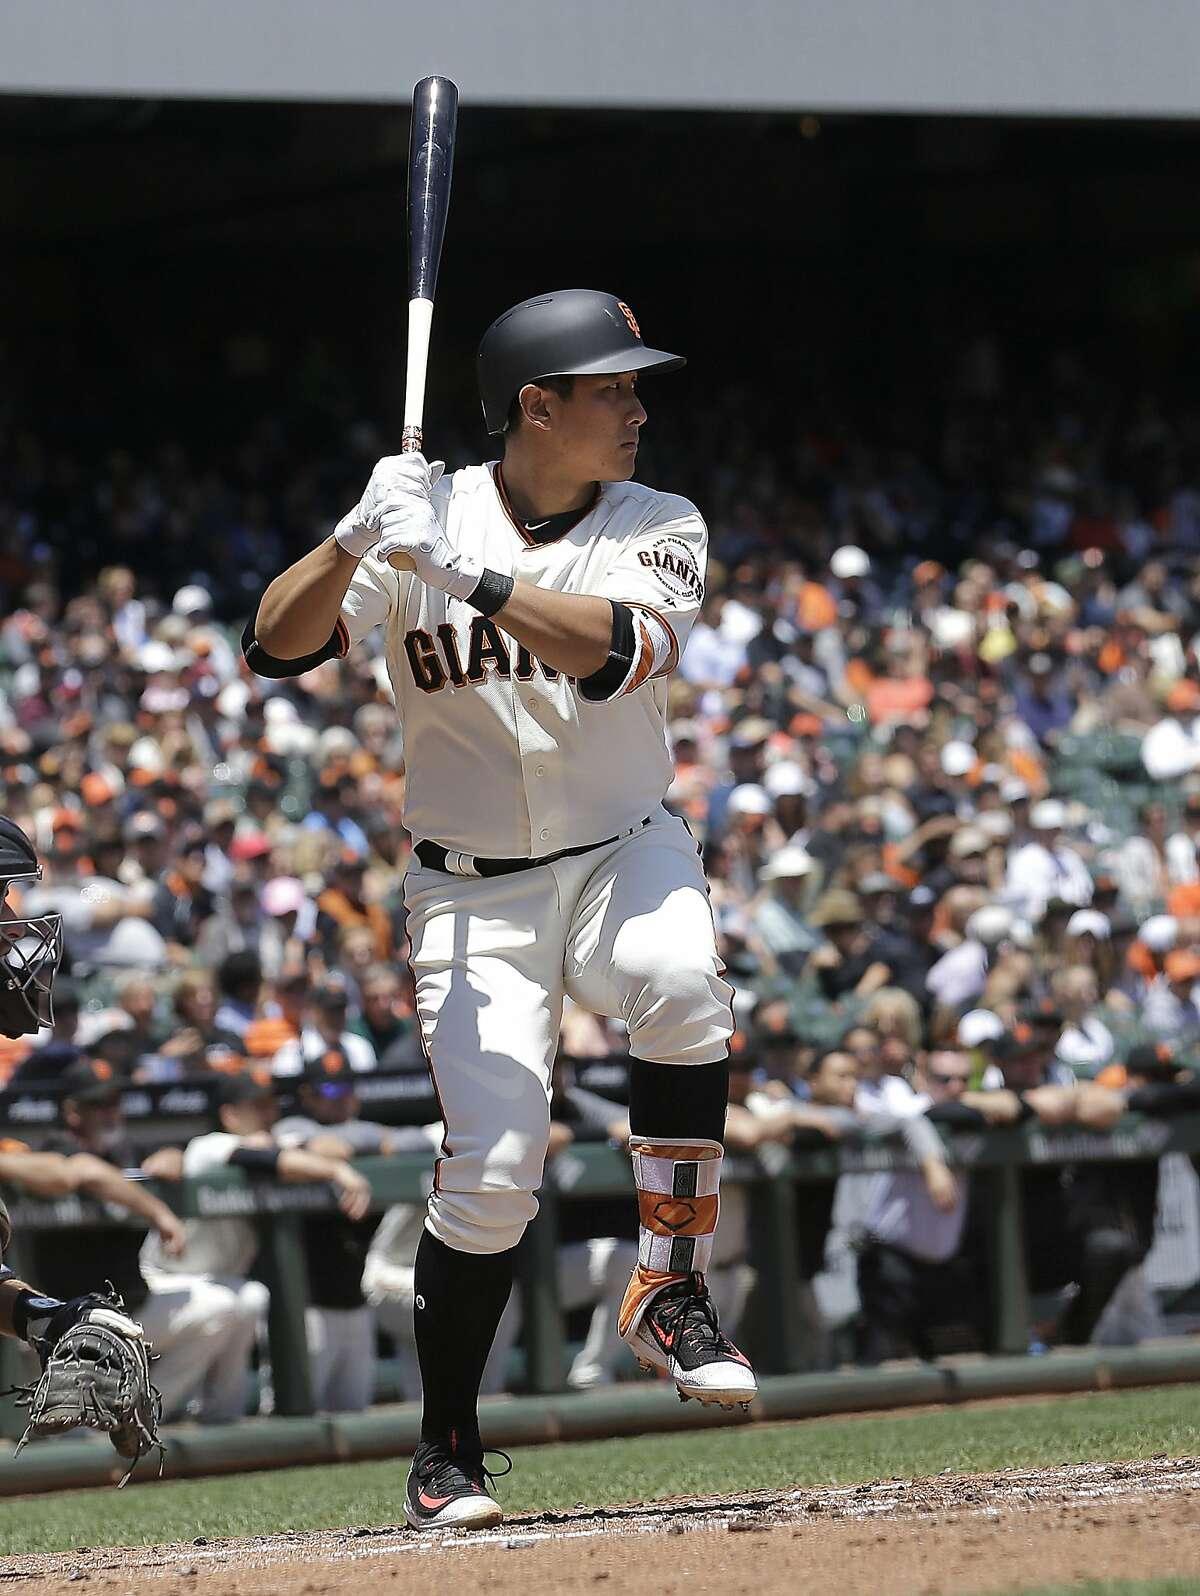 San Francisco Giants' Jae-Gyun Hwang, of South Korea, during a baseball game against the Colorado Rockies in San Francisco, Wednesday, June 28, 2017. (AP Photo/Jeff Chiu)